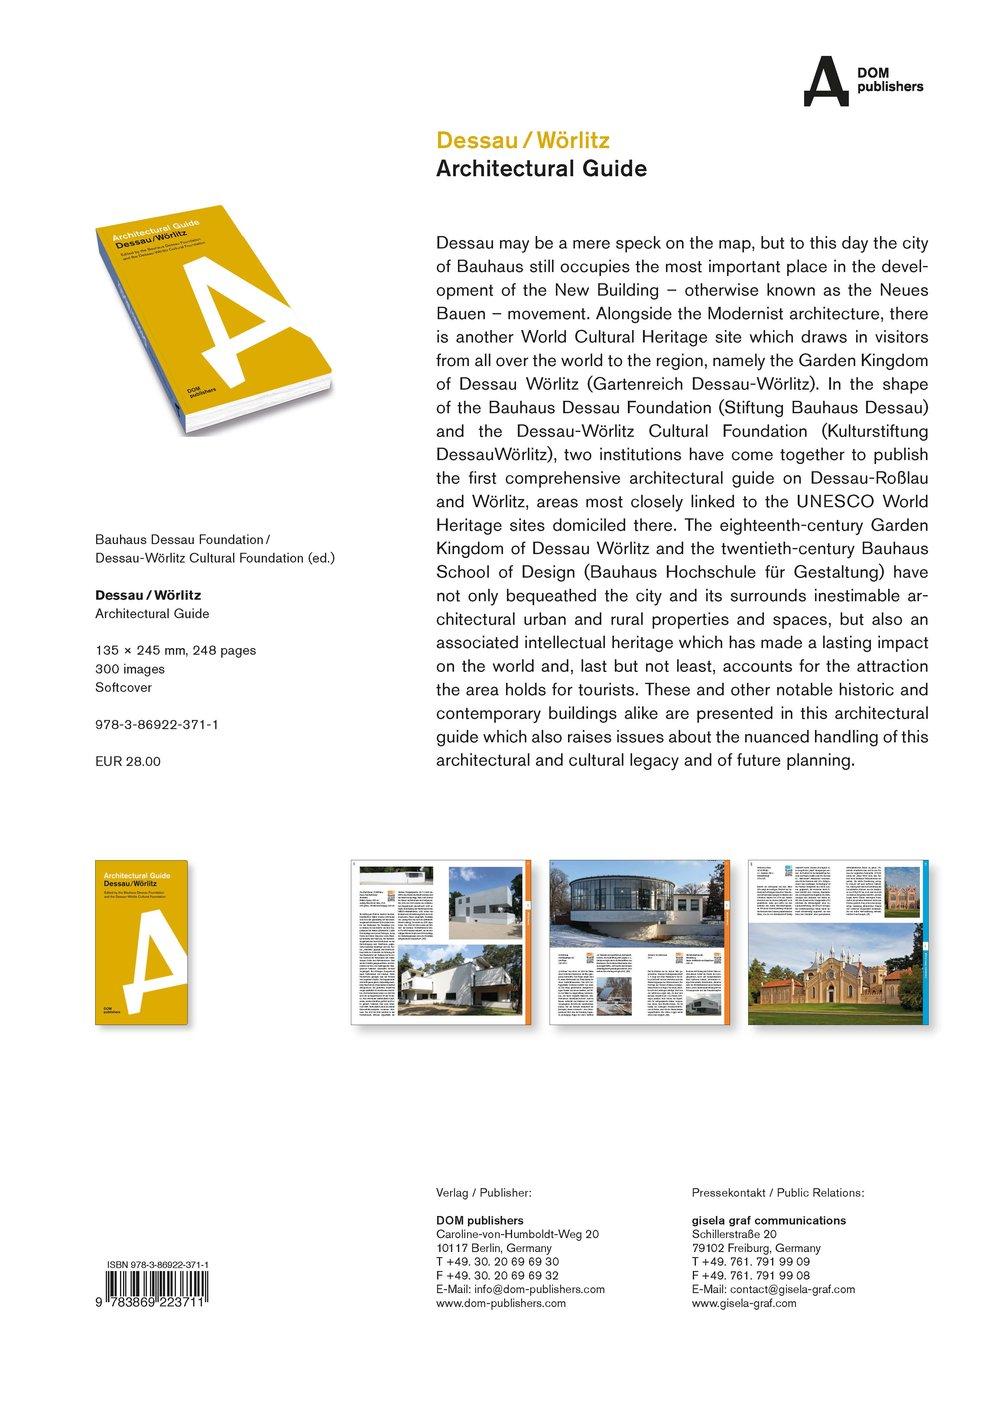 371-1_Press.jpg